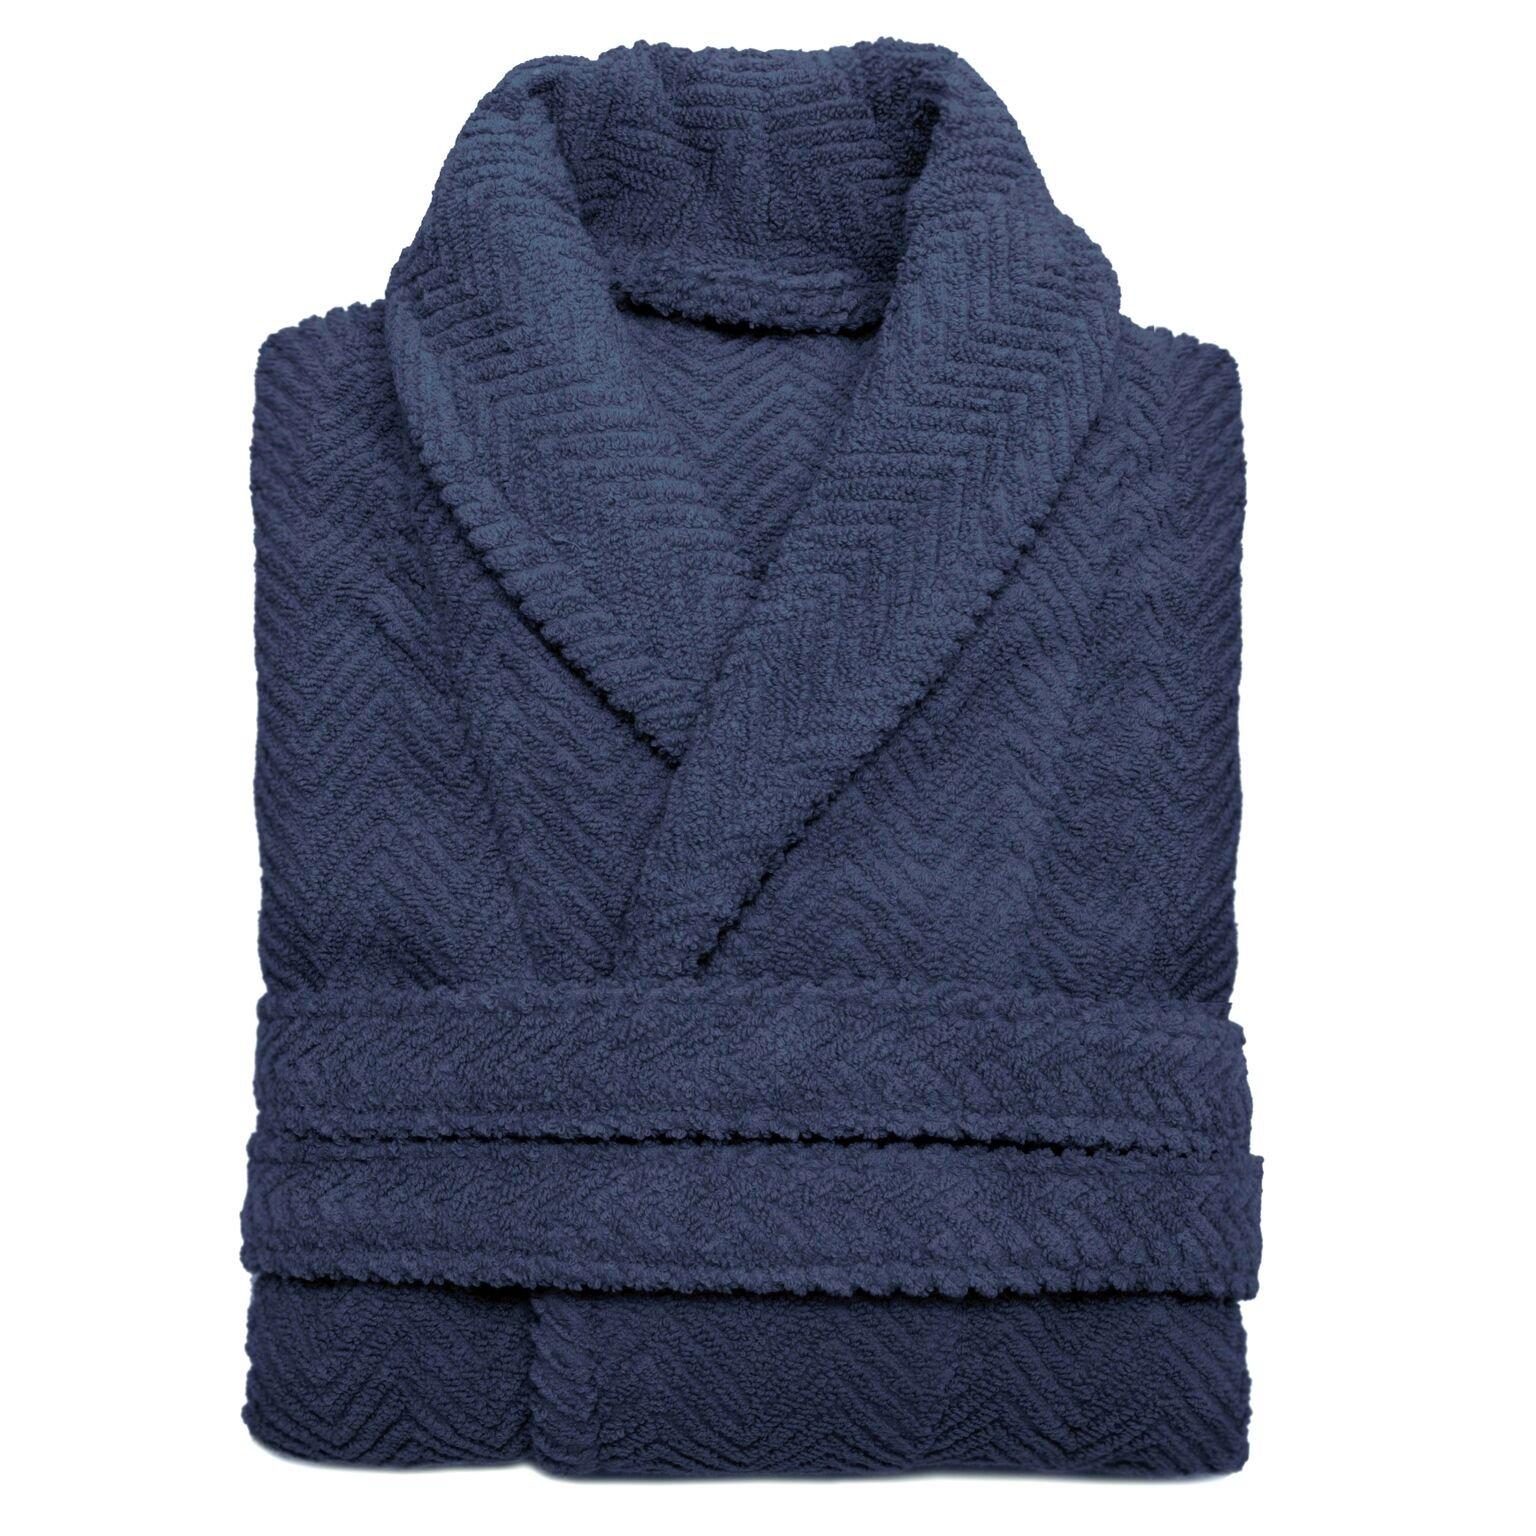 Linum Home Textiles WT50-00-LX 100% Turkish Cotton Waffle Terry Bathrobe